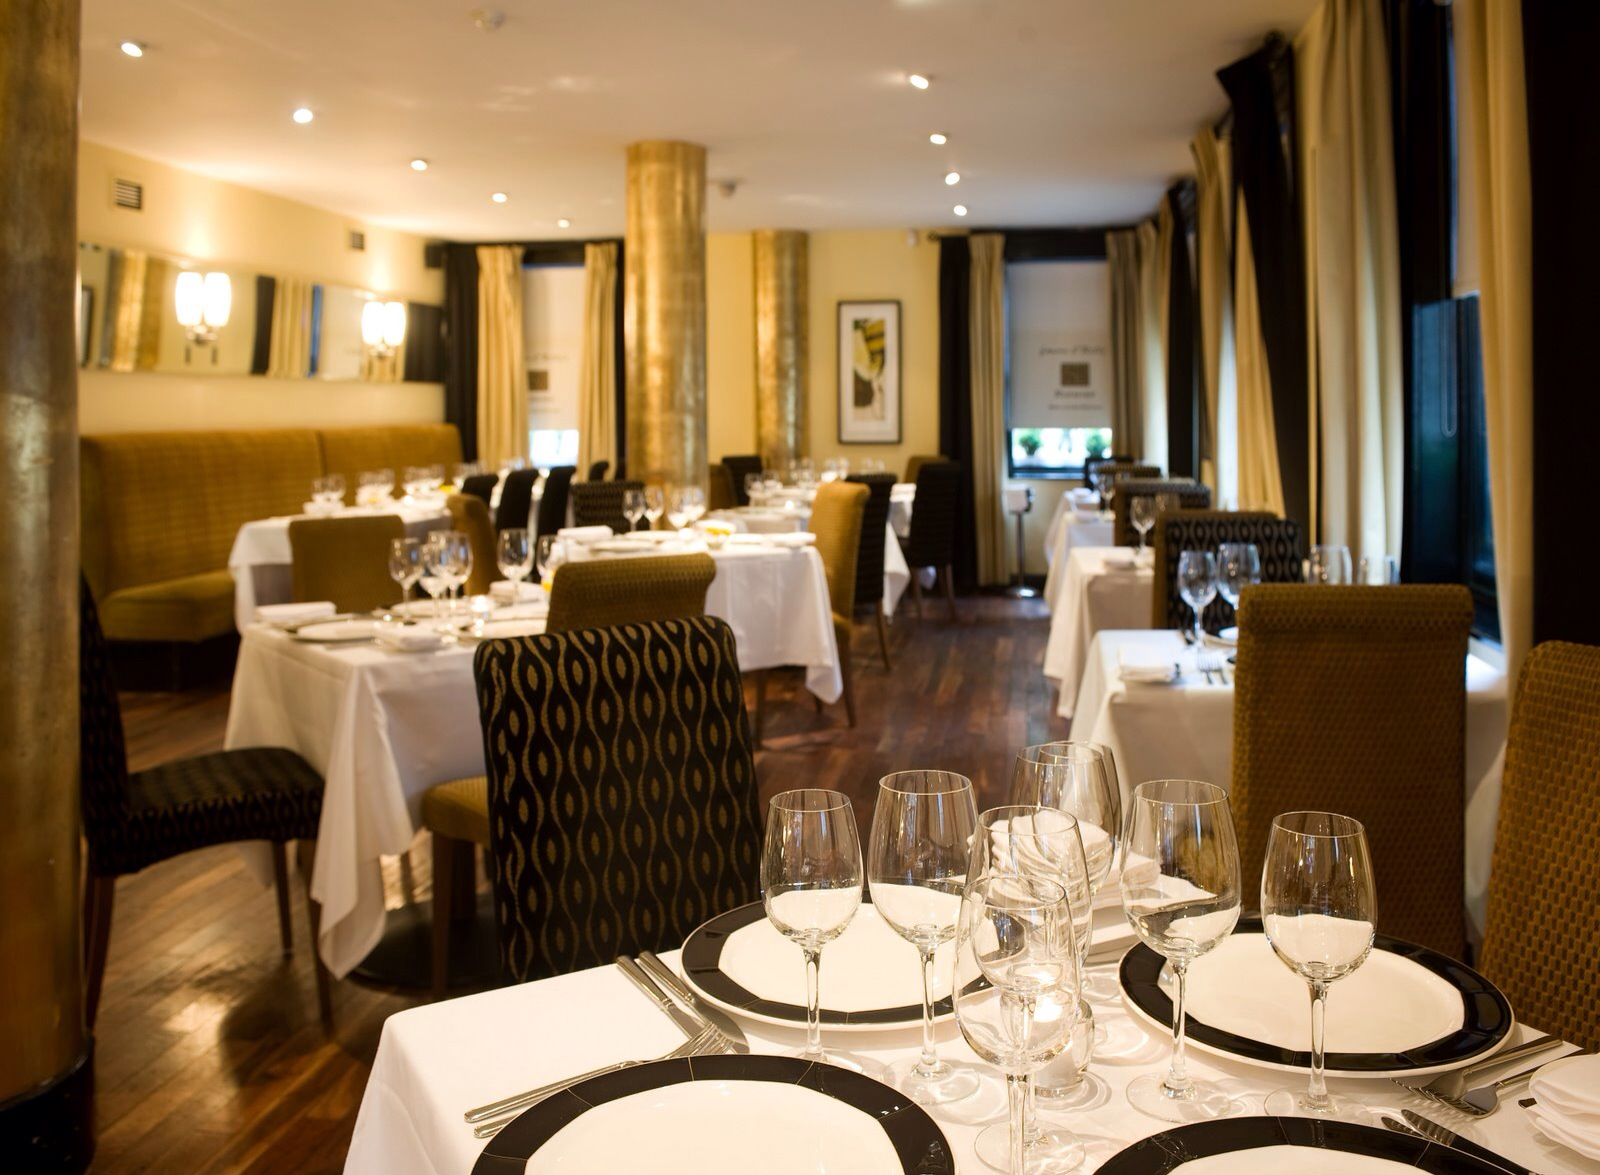 The greenhouse restaurant dublin - The Greenhouse Restaurant Dublin 19